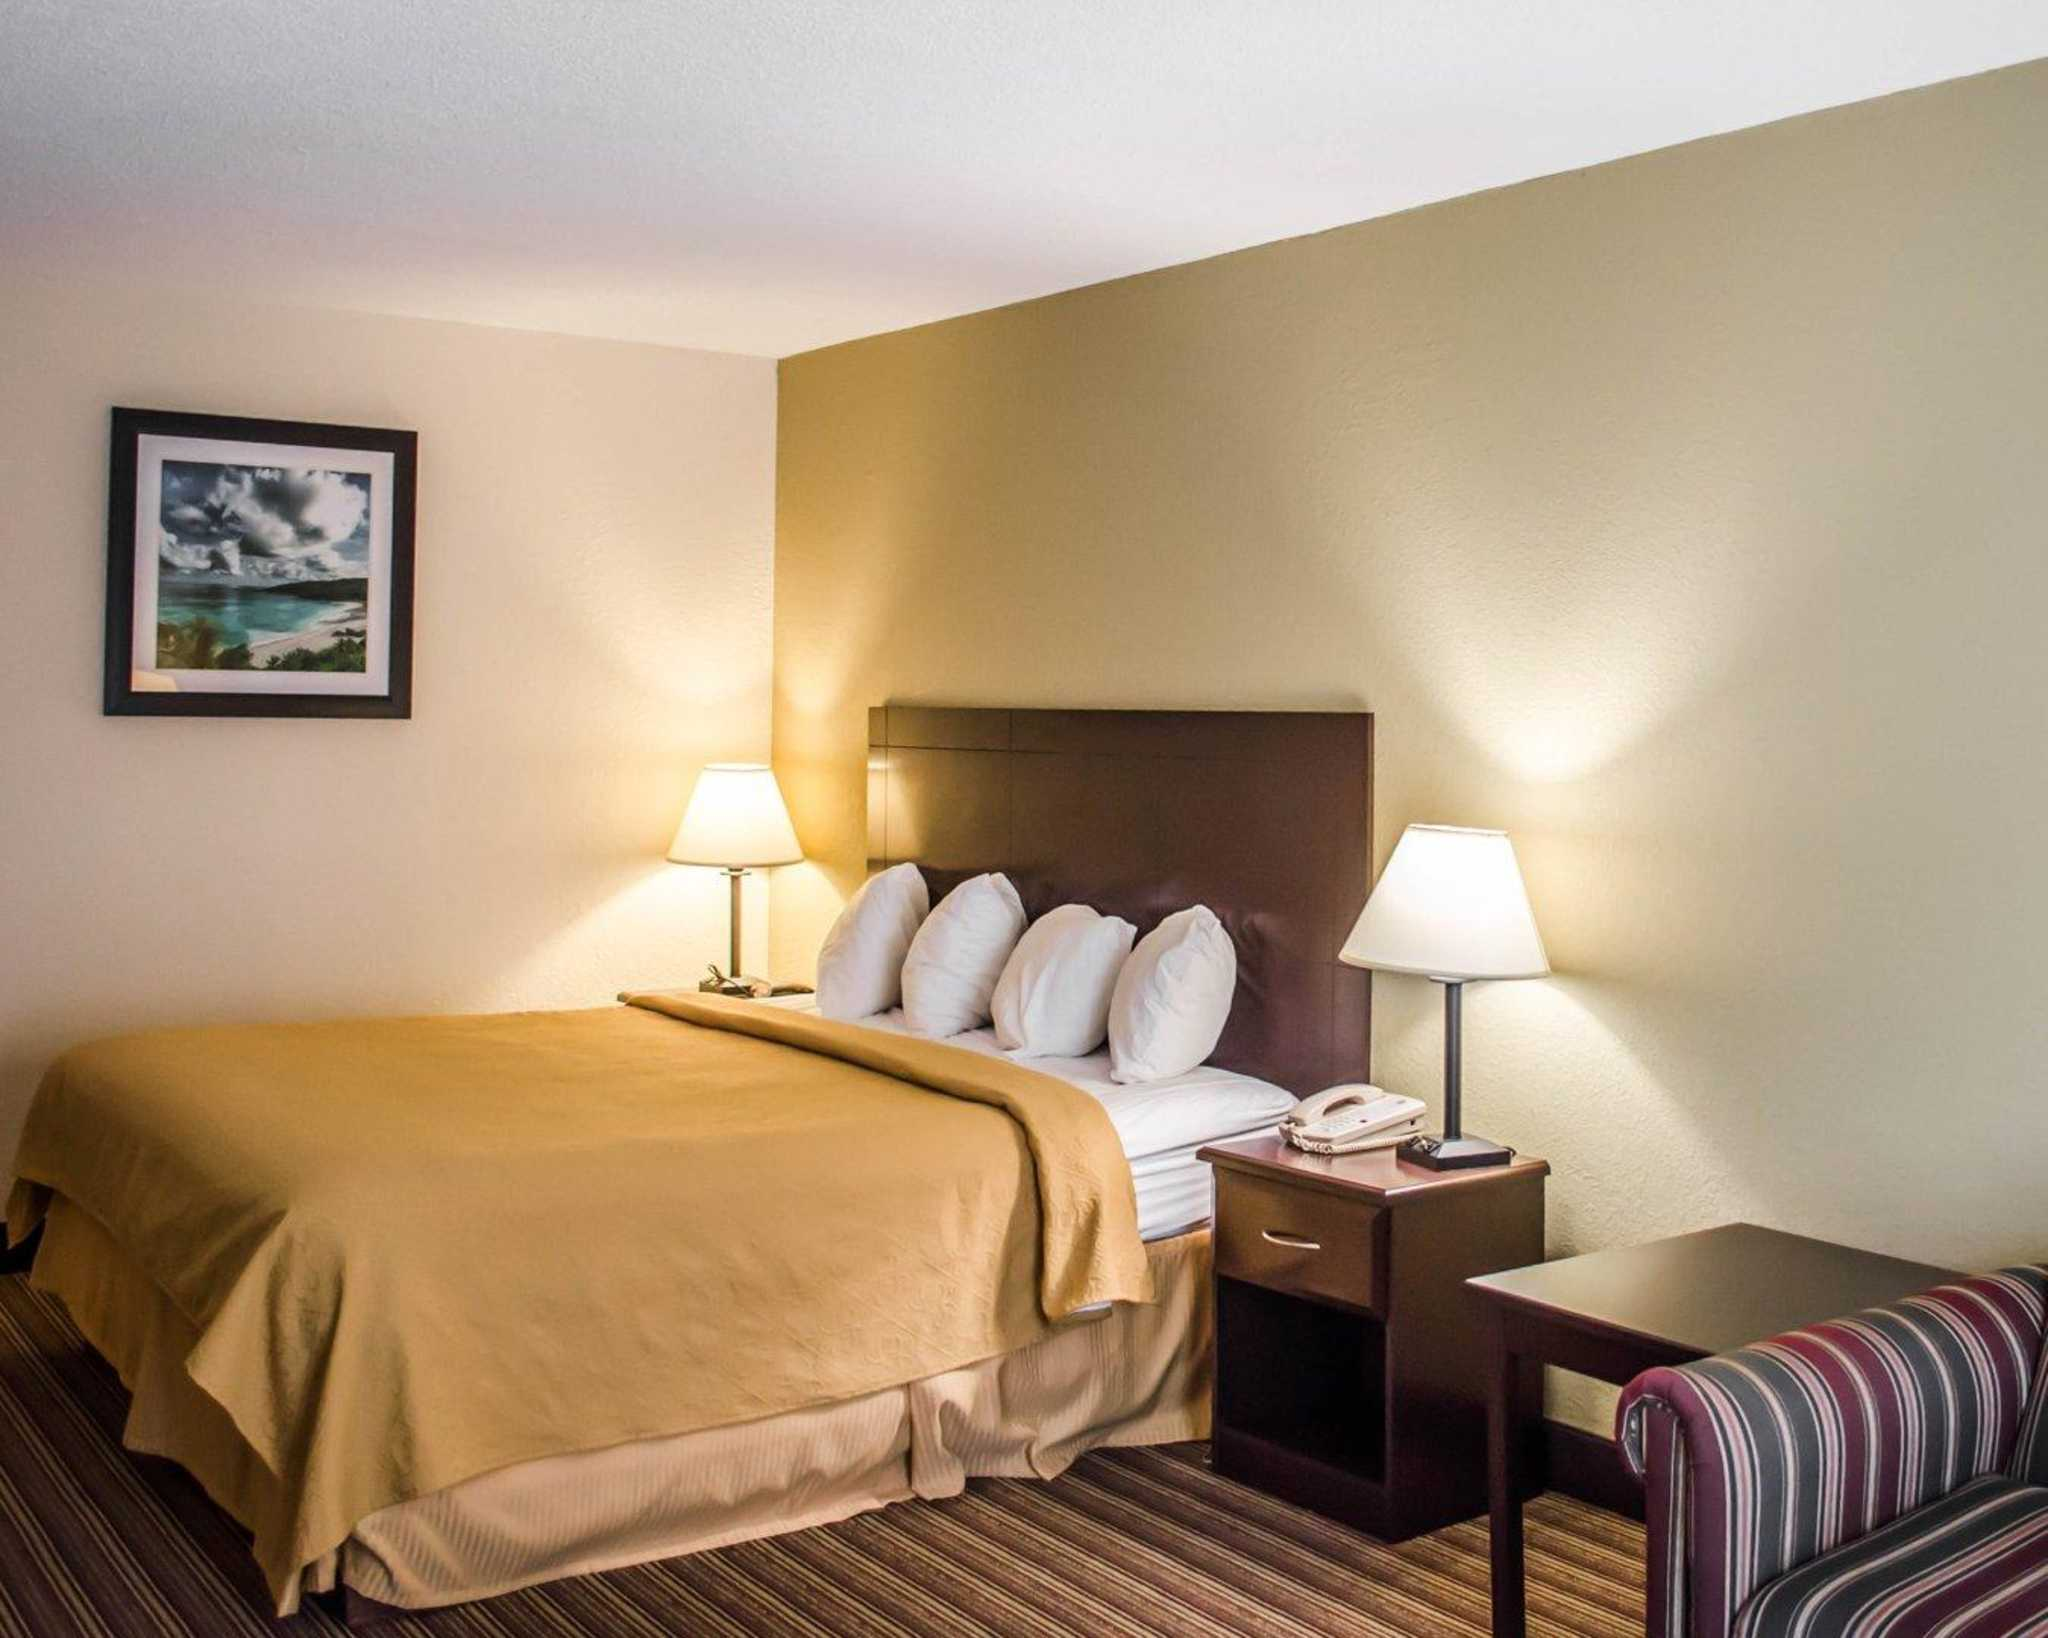 Quality Inn & Suites Pensacola Bayview in Pensacola, FL, photo #10